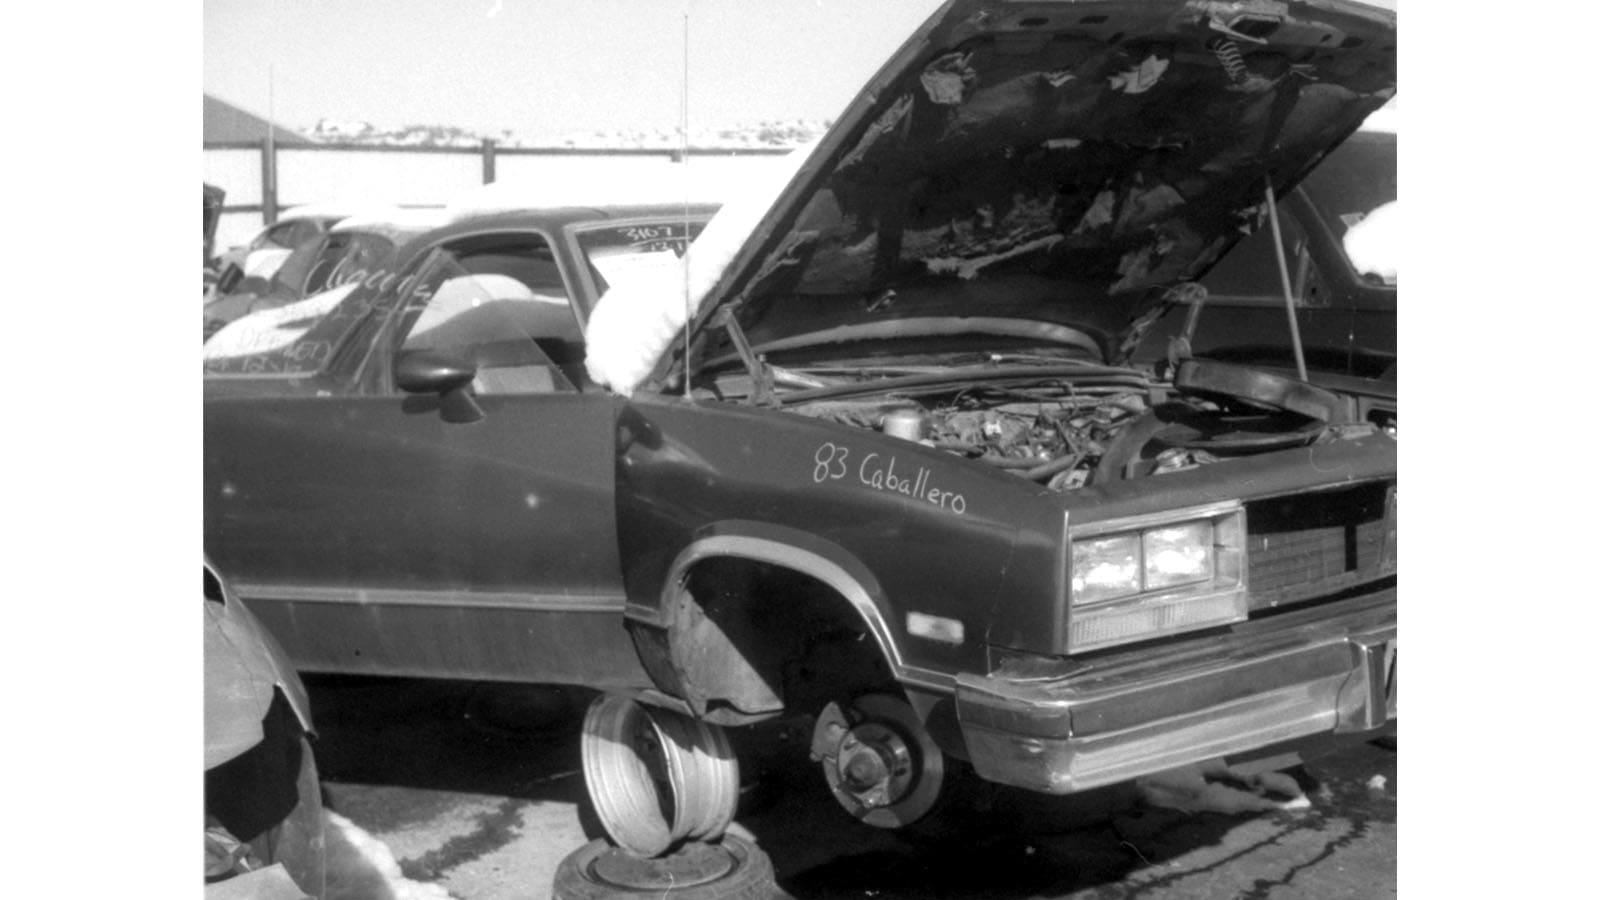 Junked 1982 GMC Caballero